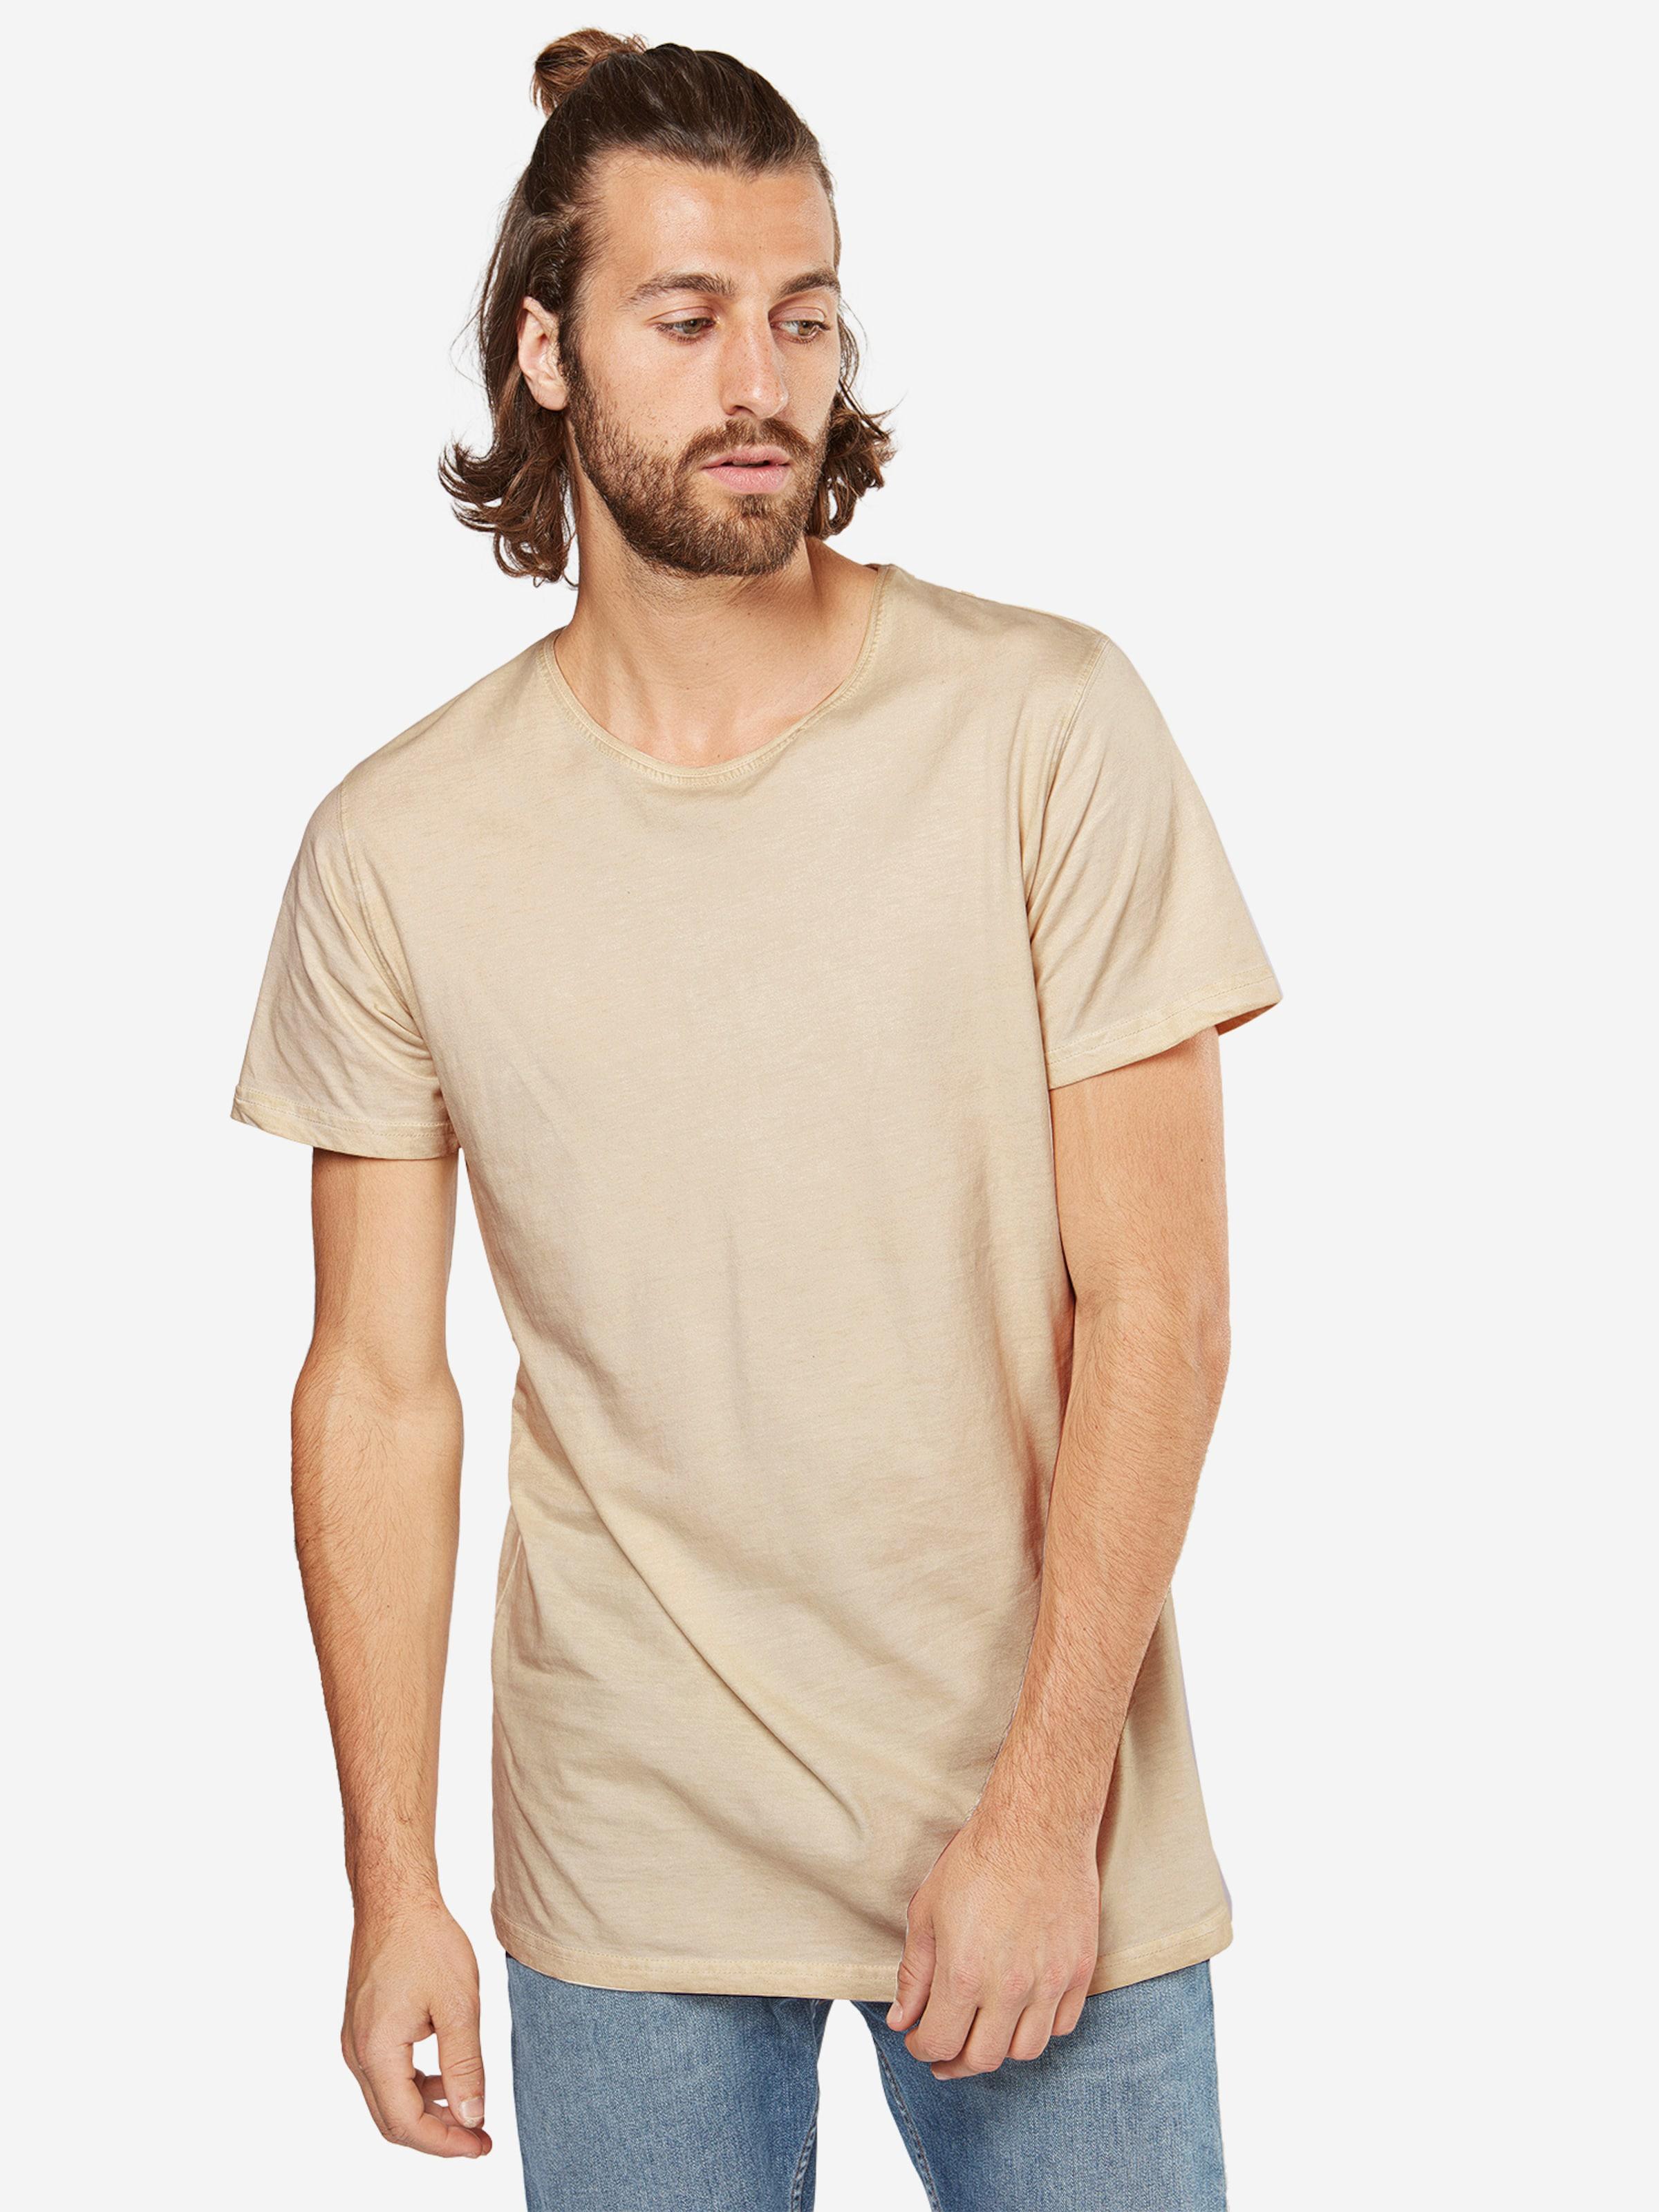 Urban Classics T-Shirt 'Shaped Long Cold Dye Tee' Billig Verkauf Echt Sie Günstig Online dxQIm